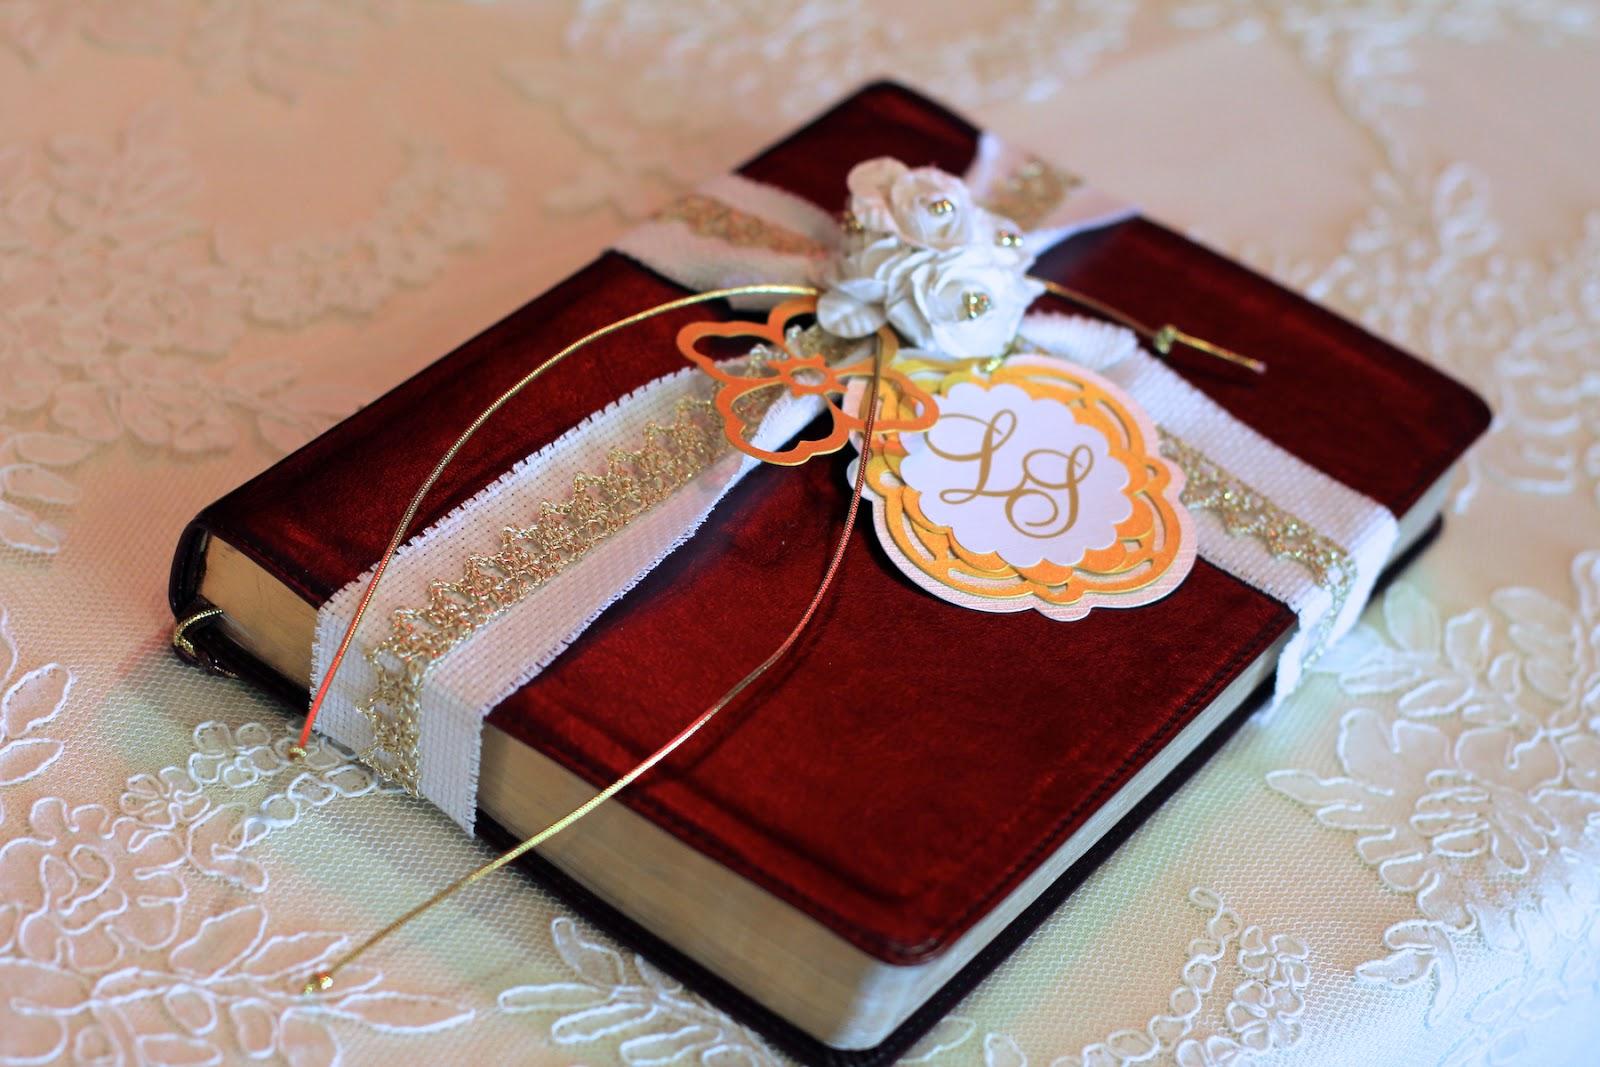 Matrimonio Cristiano Biblia : Frente cristiano de mujeres deboras matrimonio mqv y el